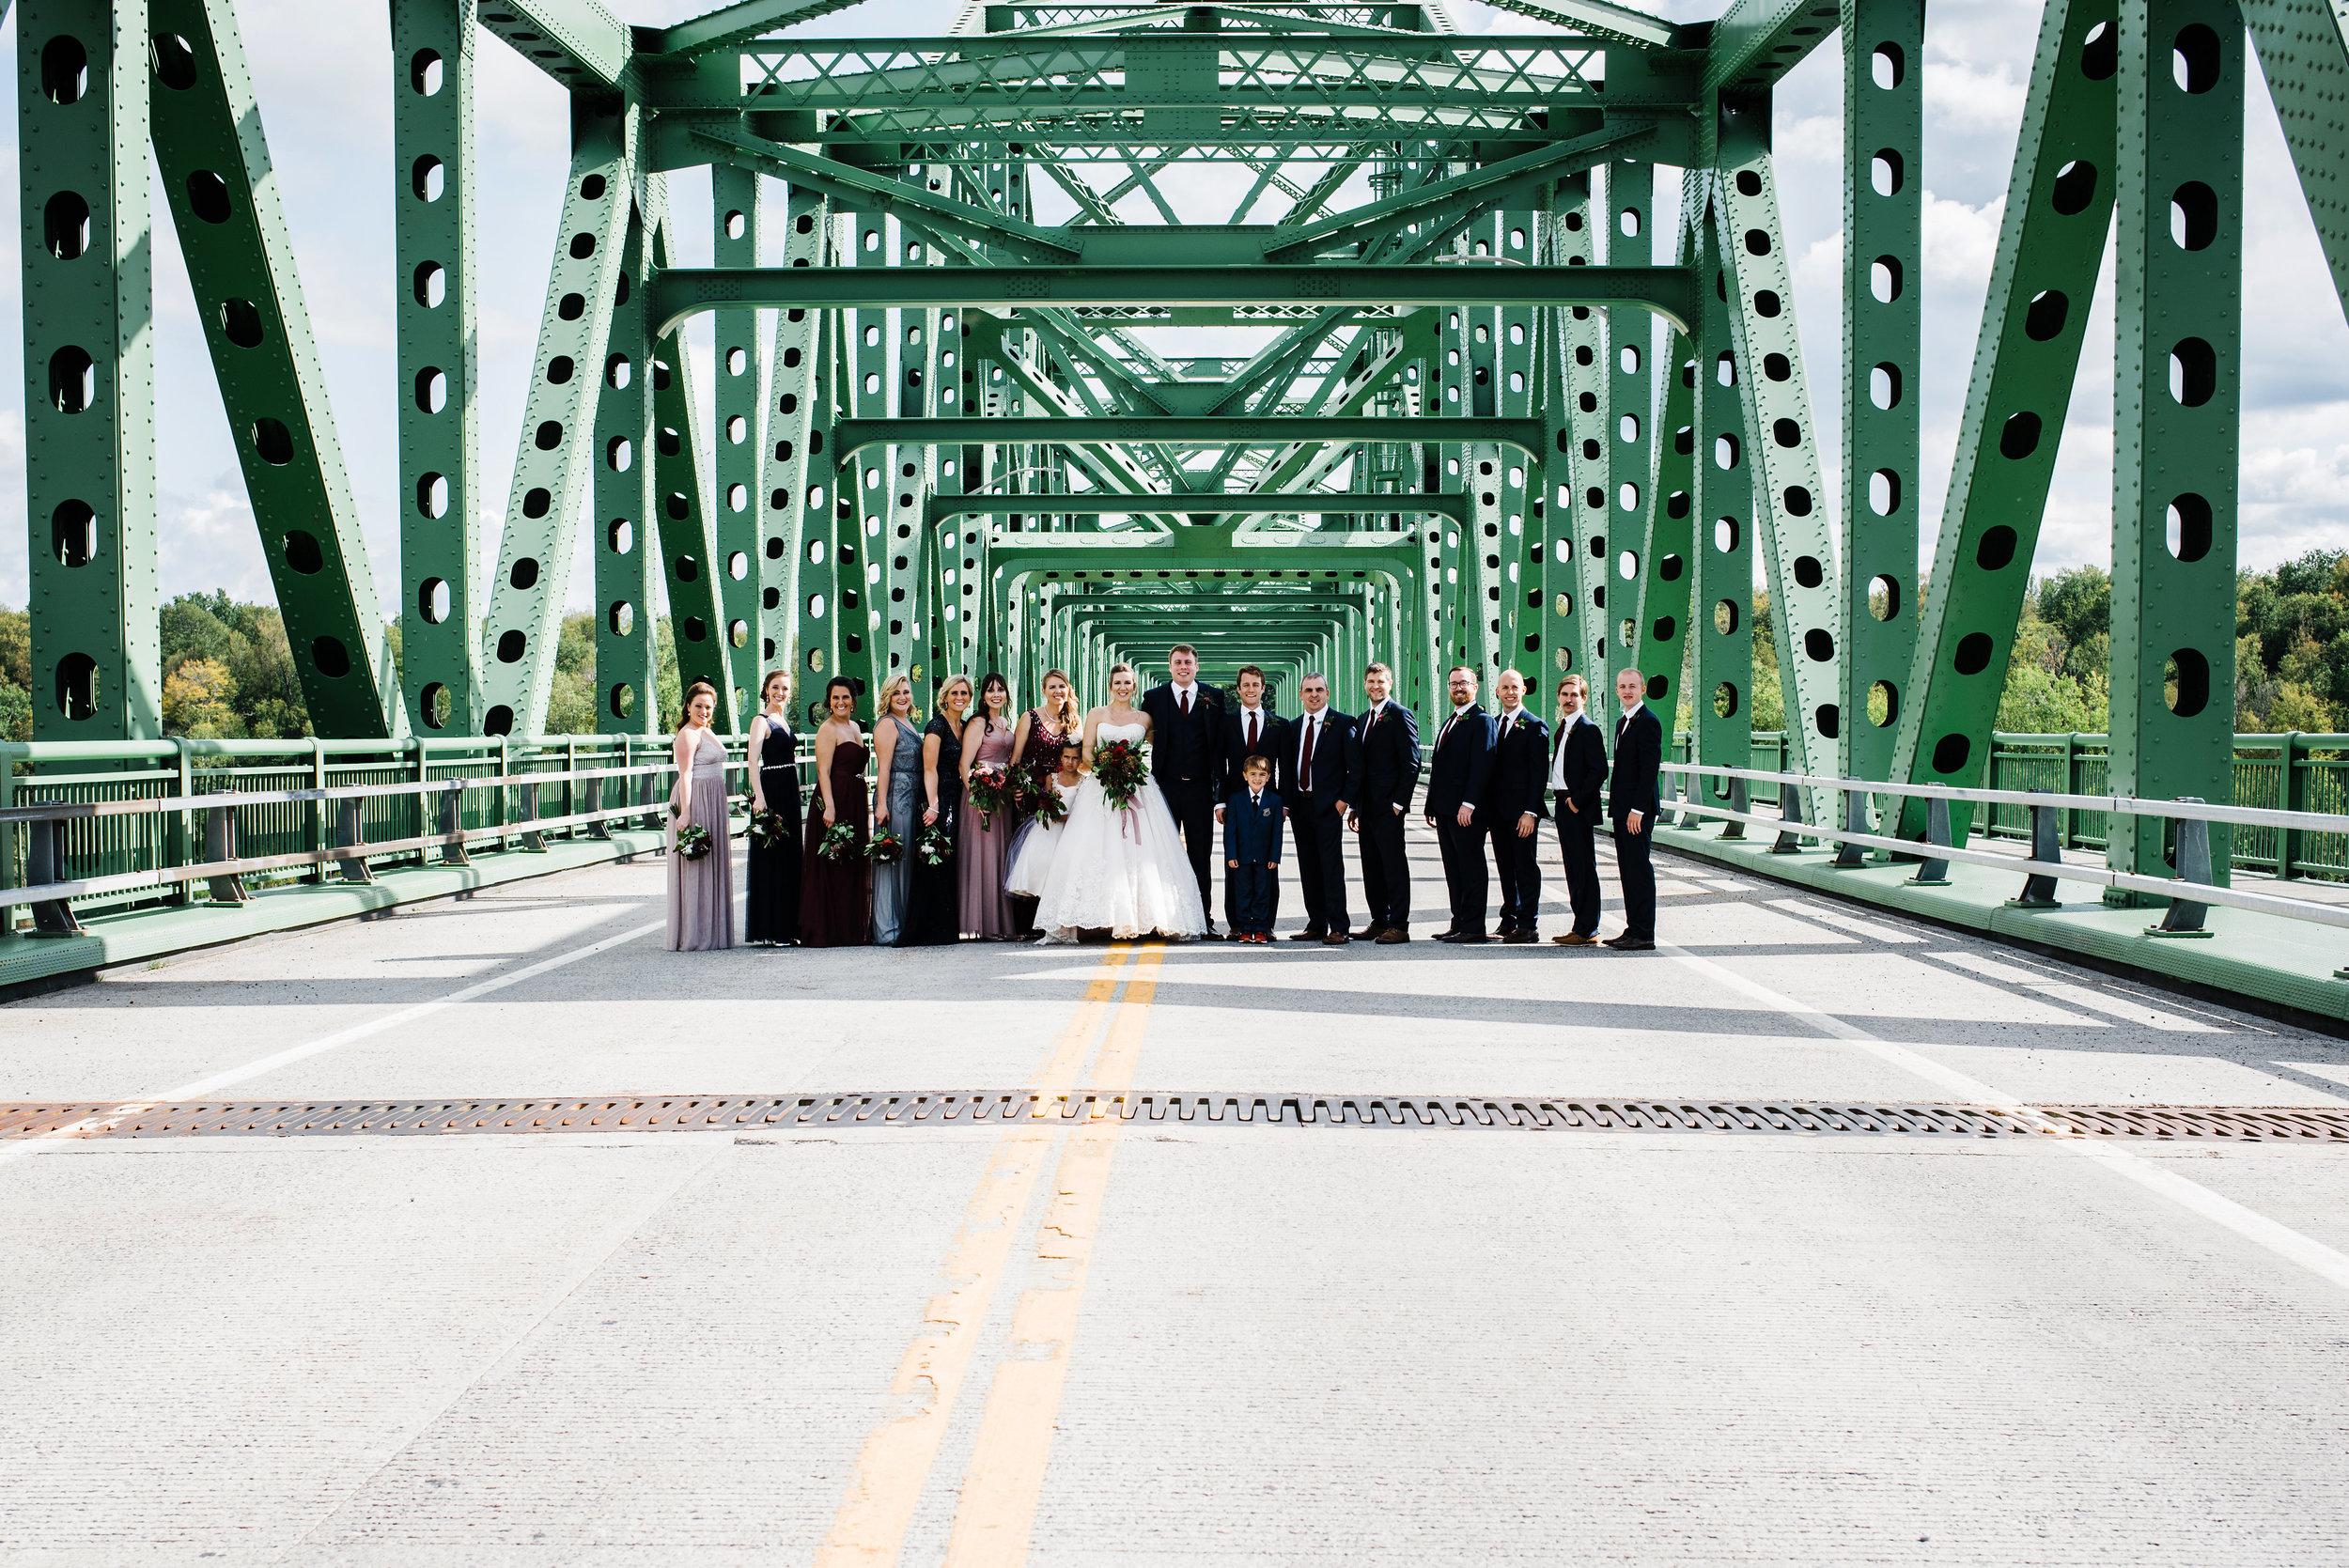 st_lawrence_wedding_bridge_perennia.jpg